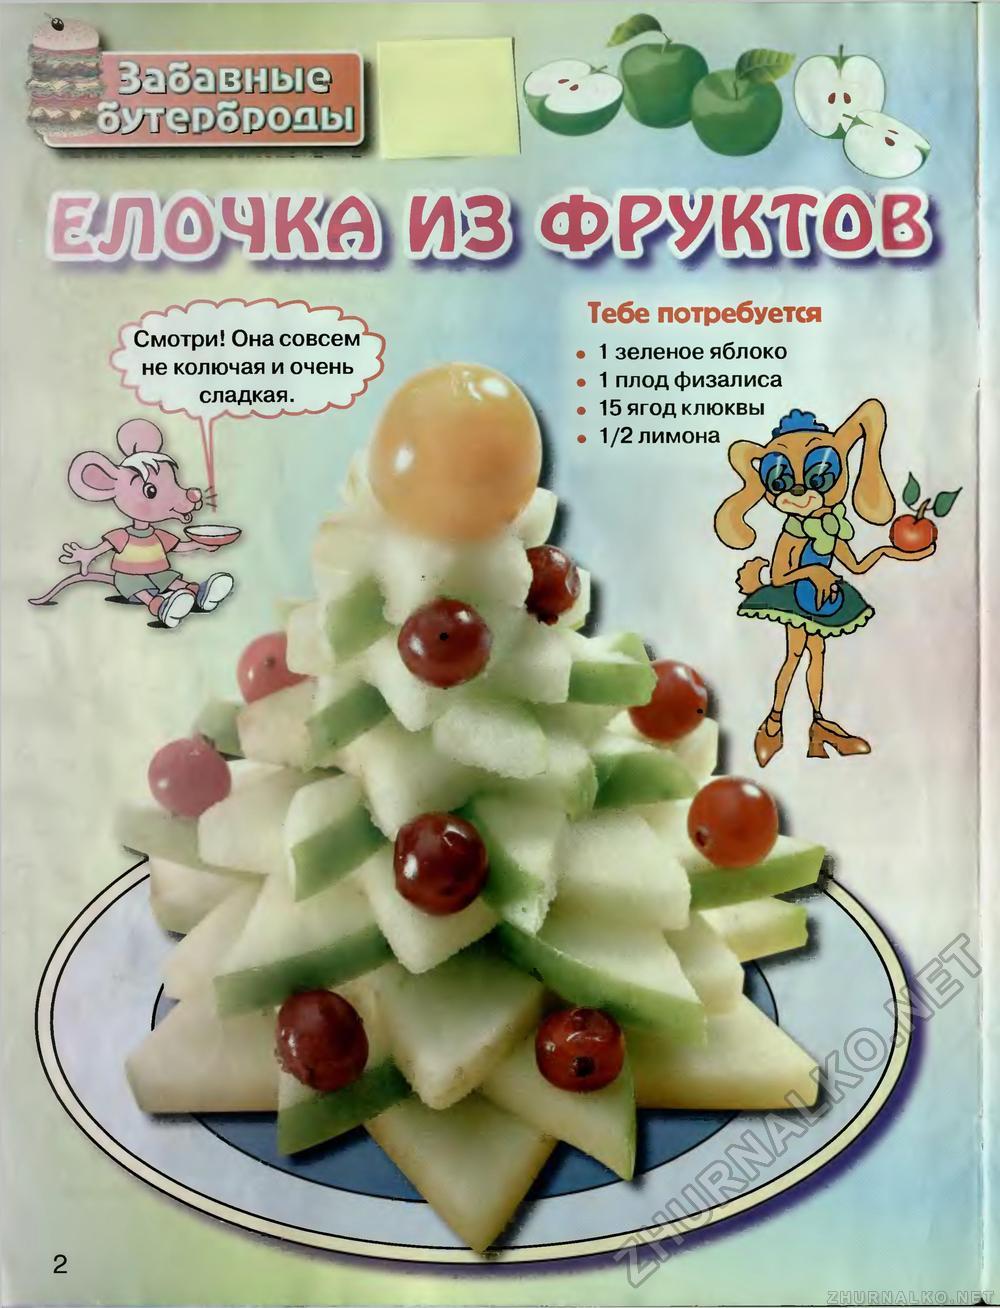 Меню для ребенка 3 лет рецепты пошагово